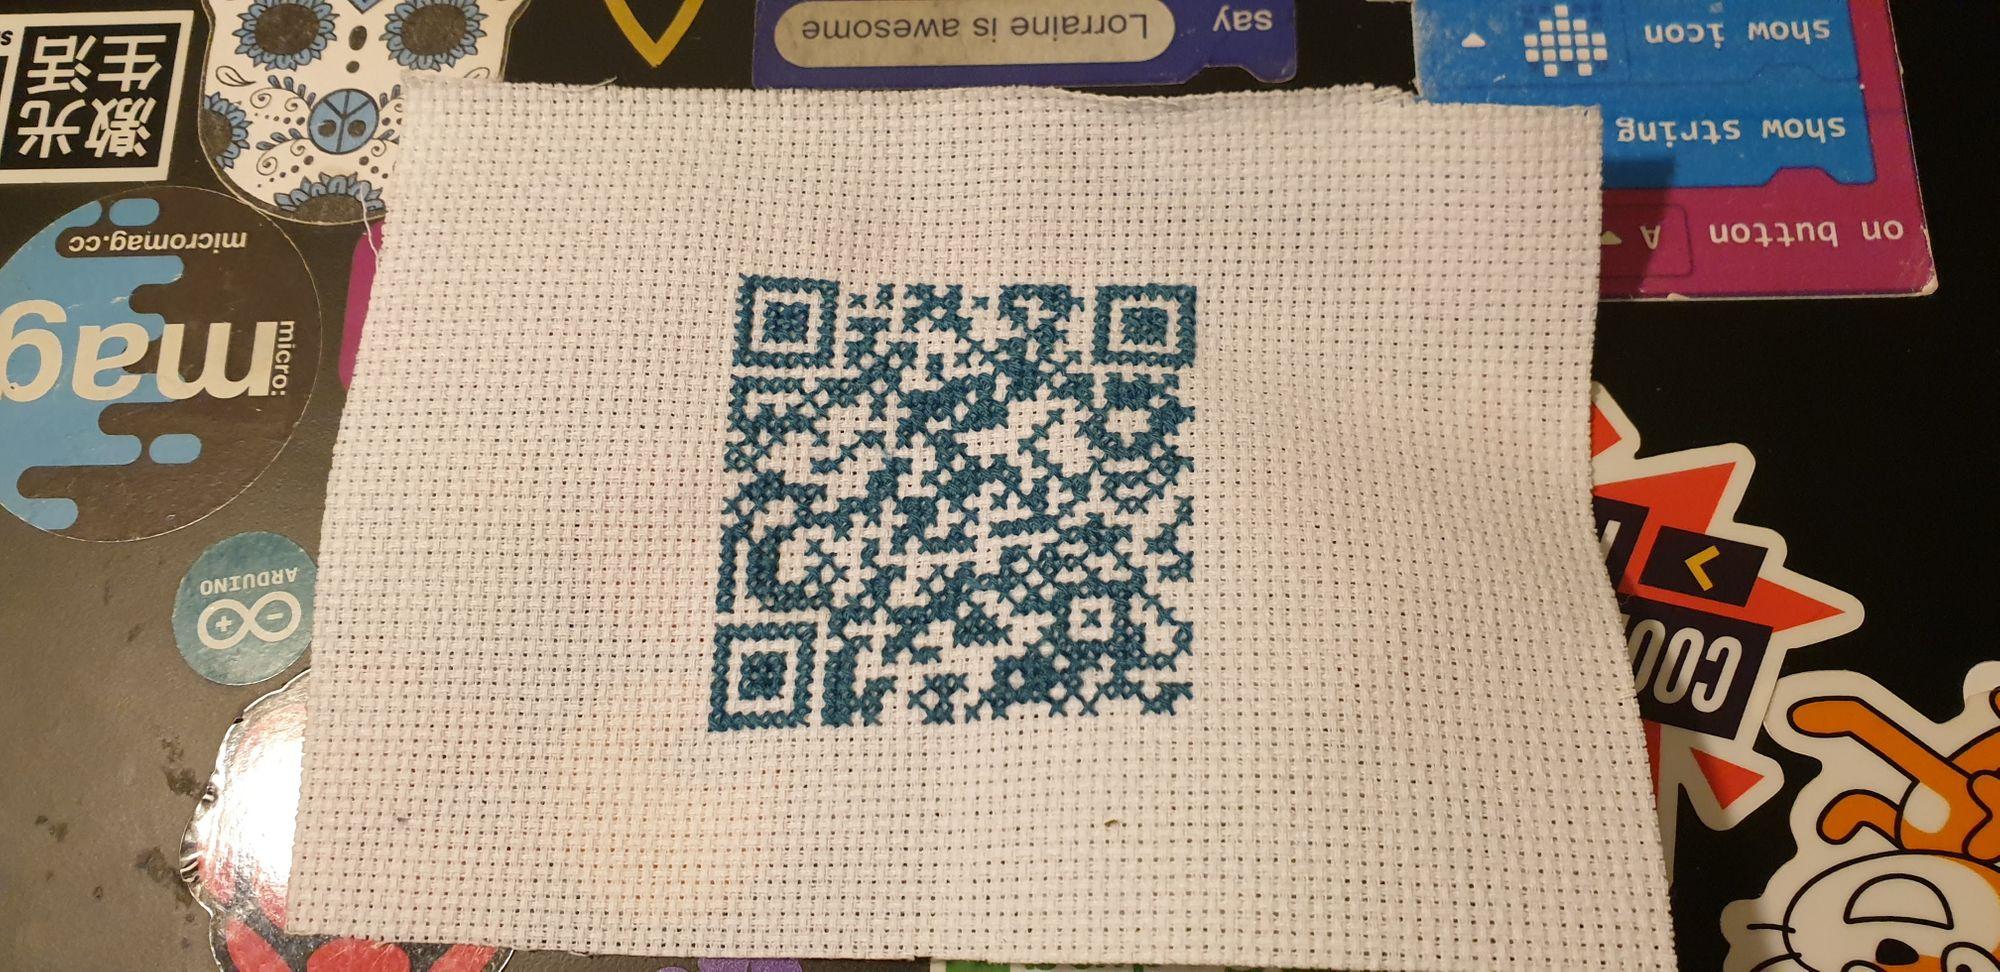 Stitch your own QR code